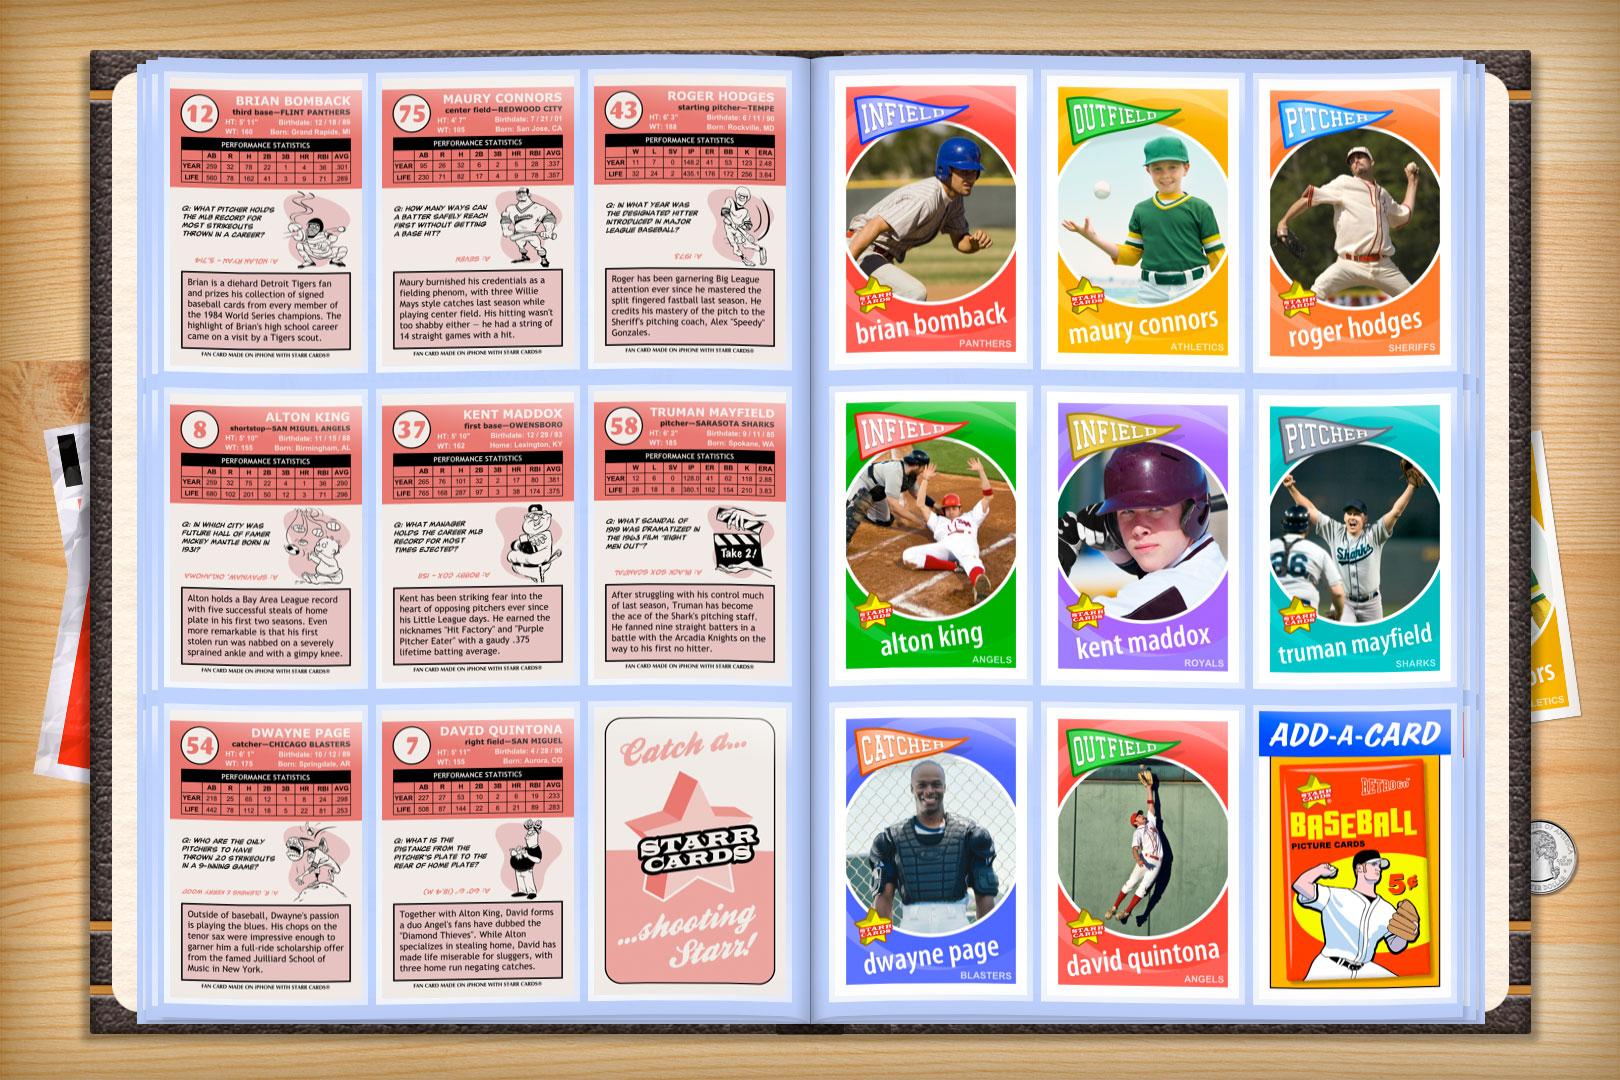 Baseball Card Template   Custom Baseball Cards Retro 60 Series Starr Cards